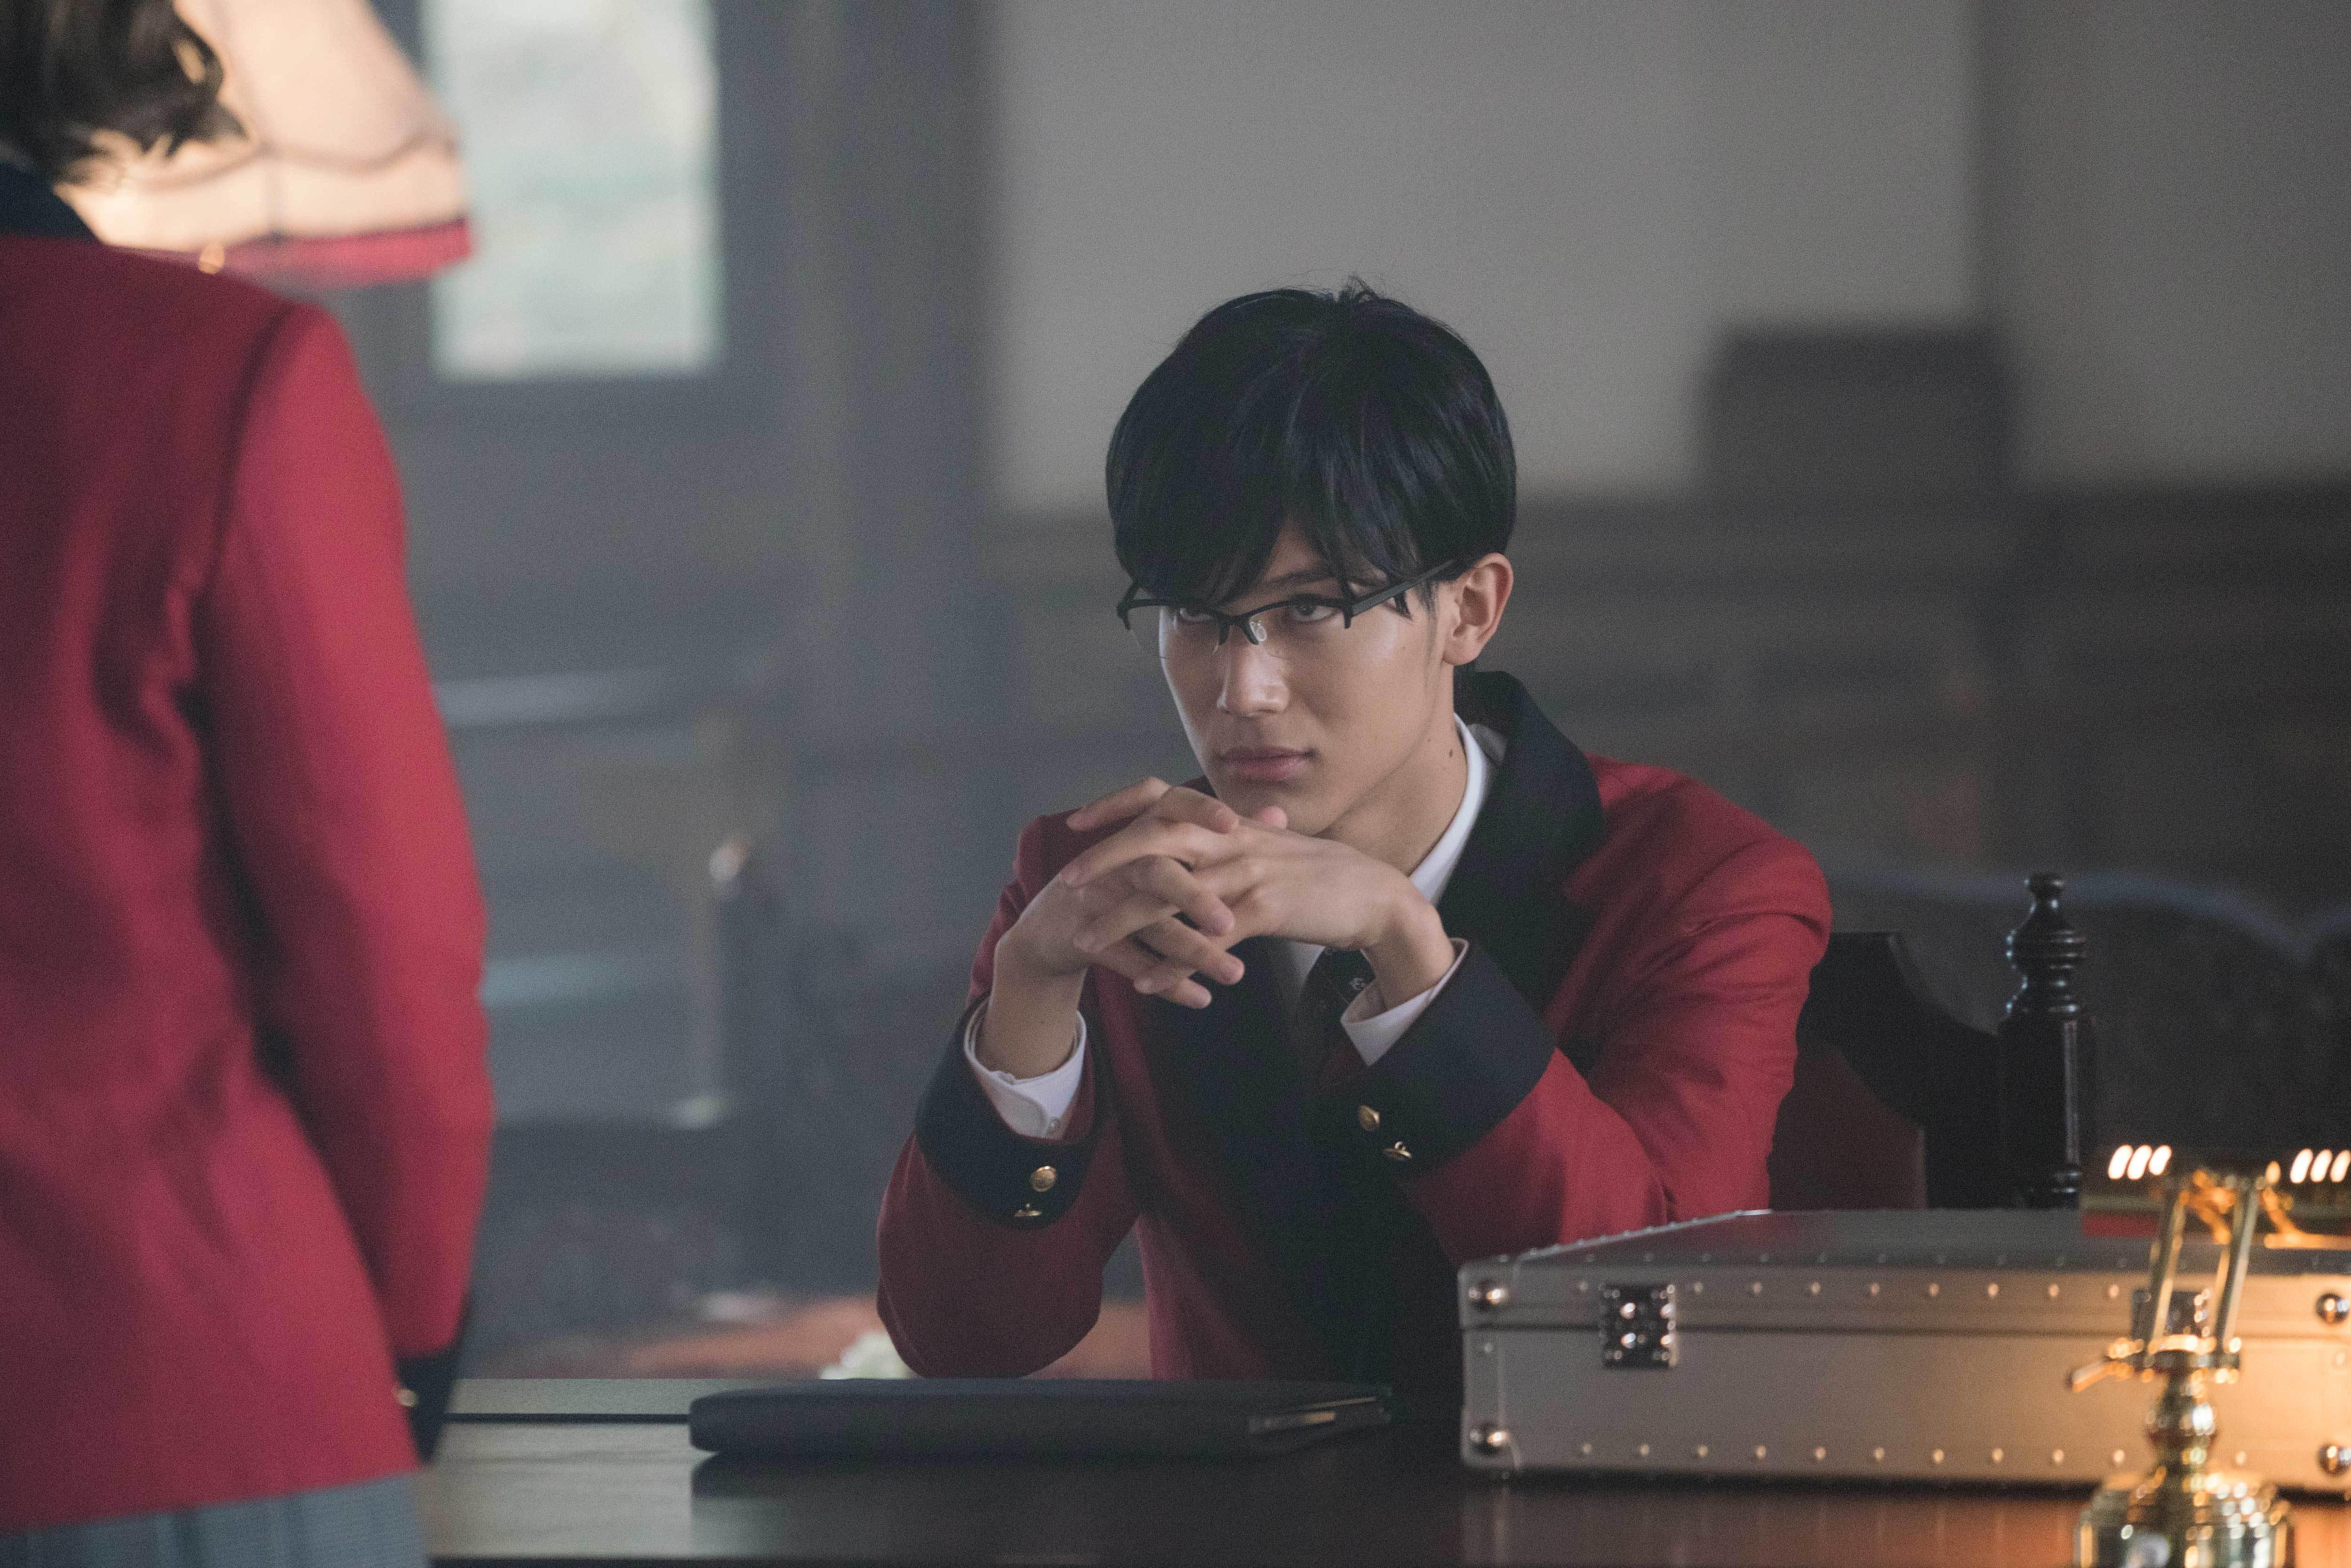 (C)河本ほむら・尚村透/SQUARE ENIX・ ドラマ「賭ケグルイ」製作委員会・MBS